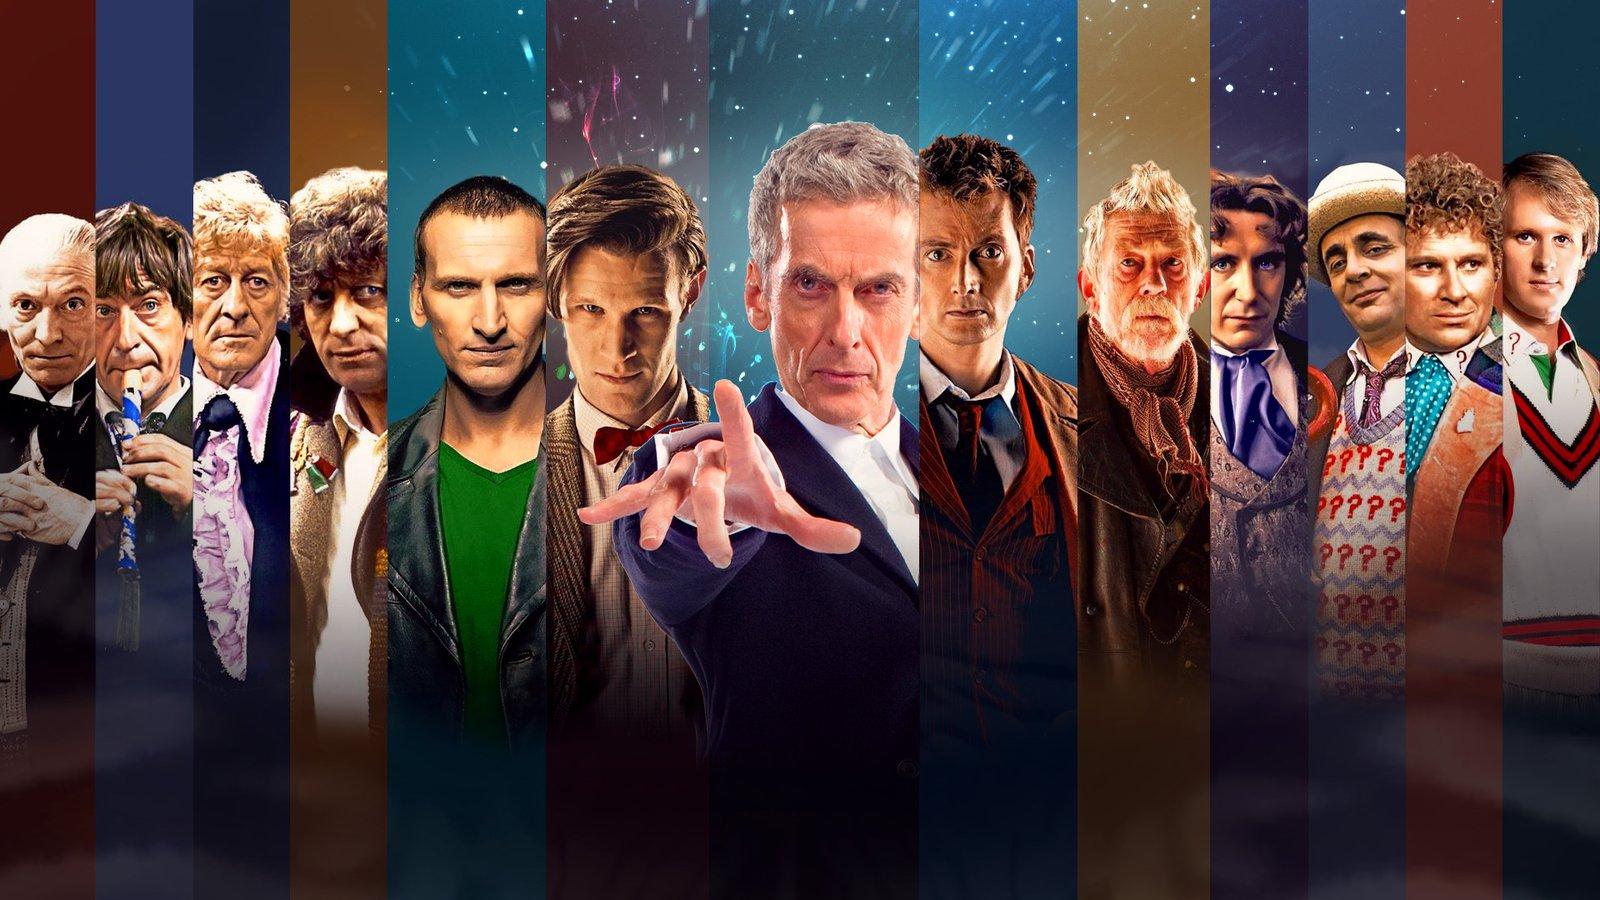 Доктор Кто / Doctor Who background